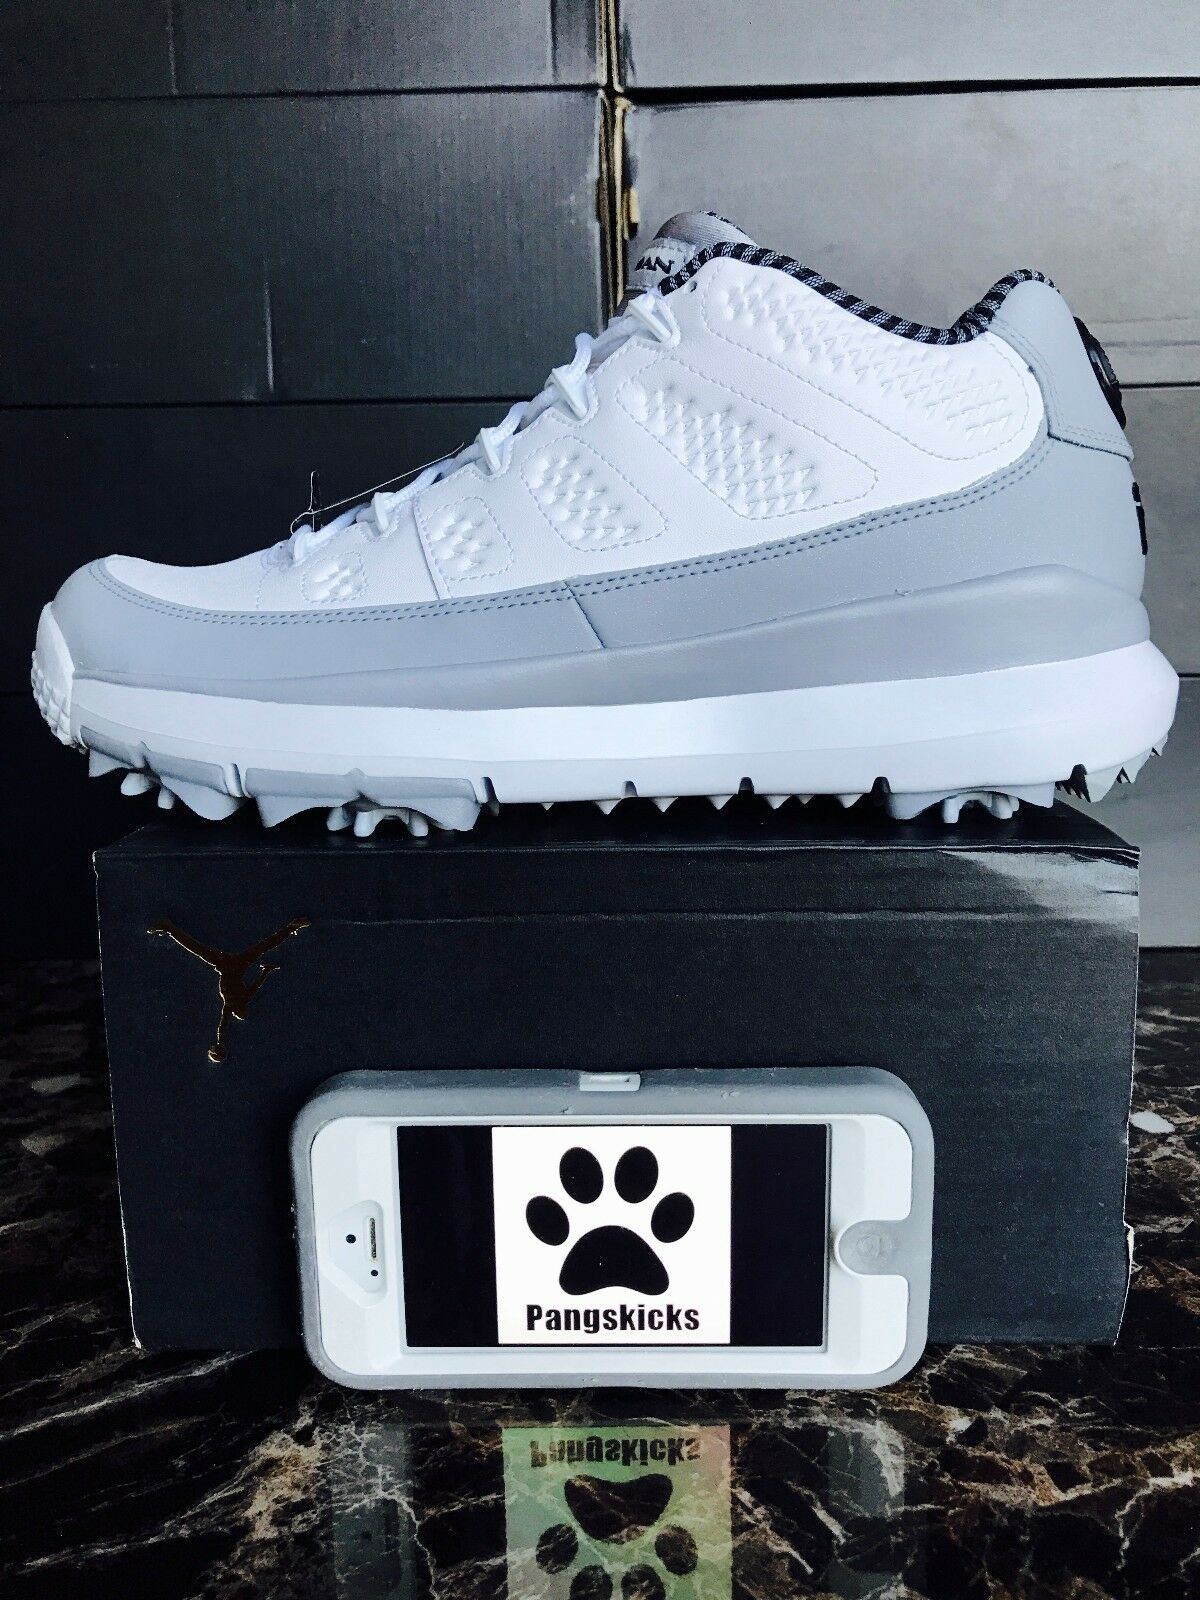 1a7cfacd690 Nike Air Jordan 9 Retro Golf